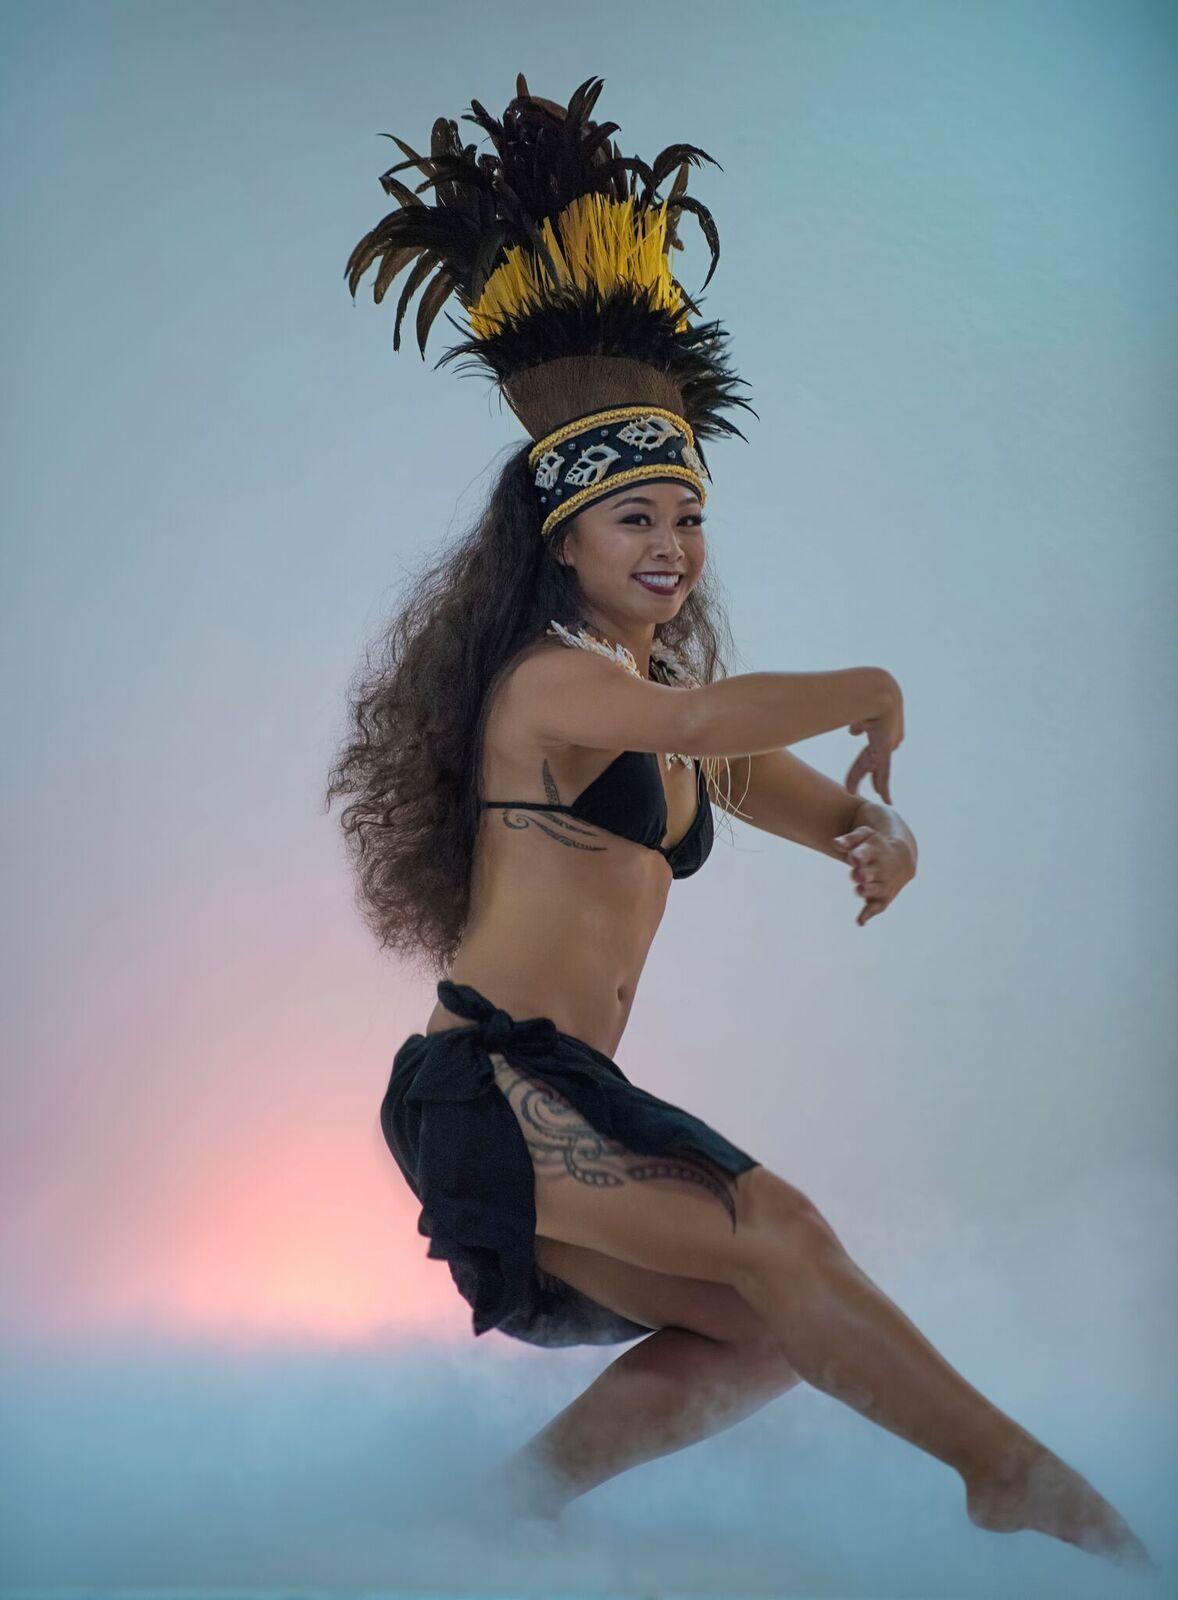 Heremata & Vahine Instructor: Melanee Tano - PC: DANNY TAN